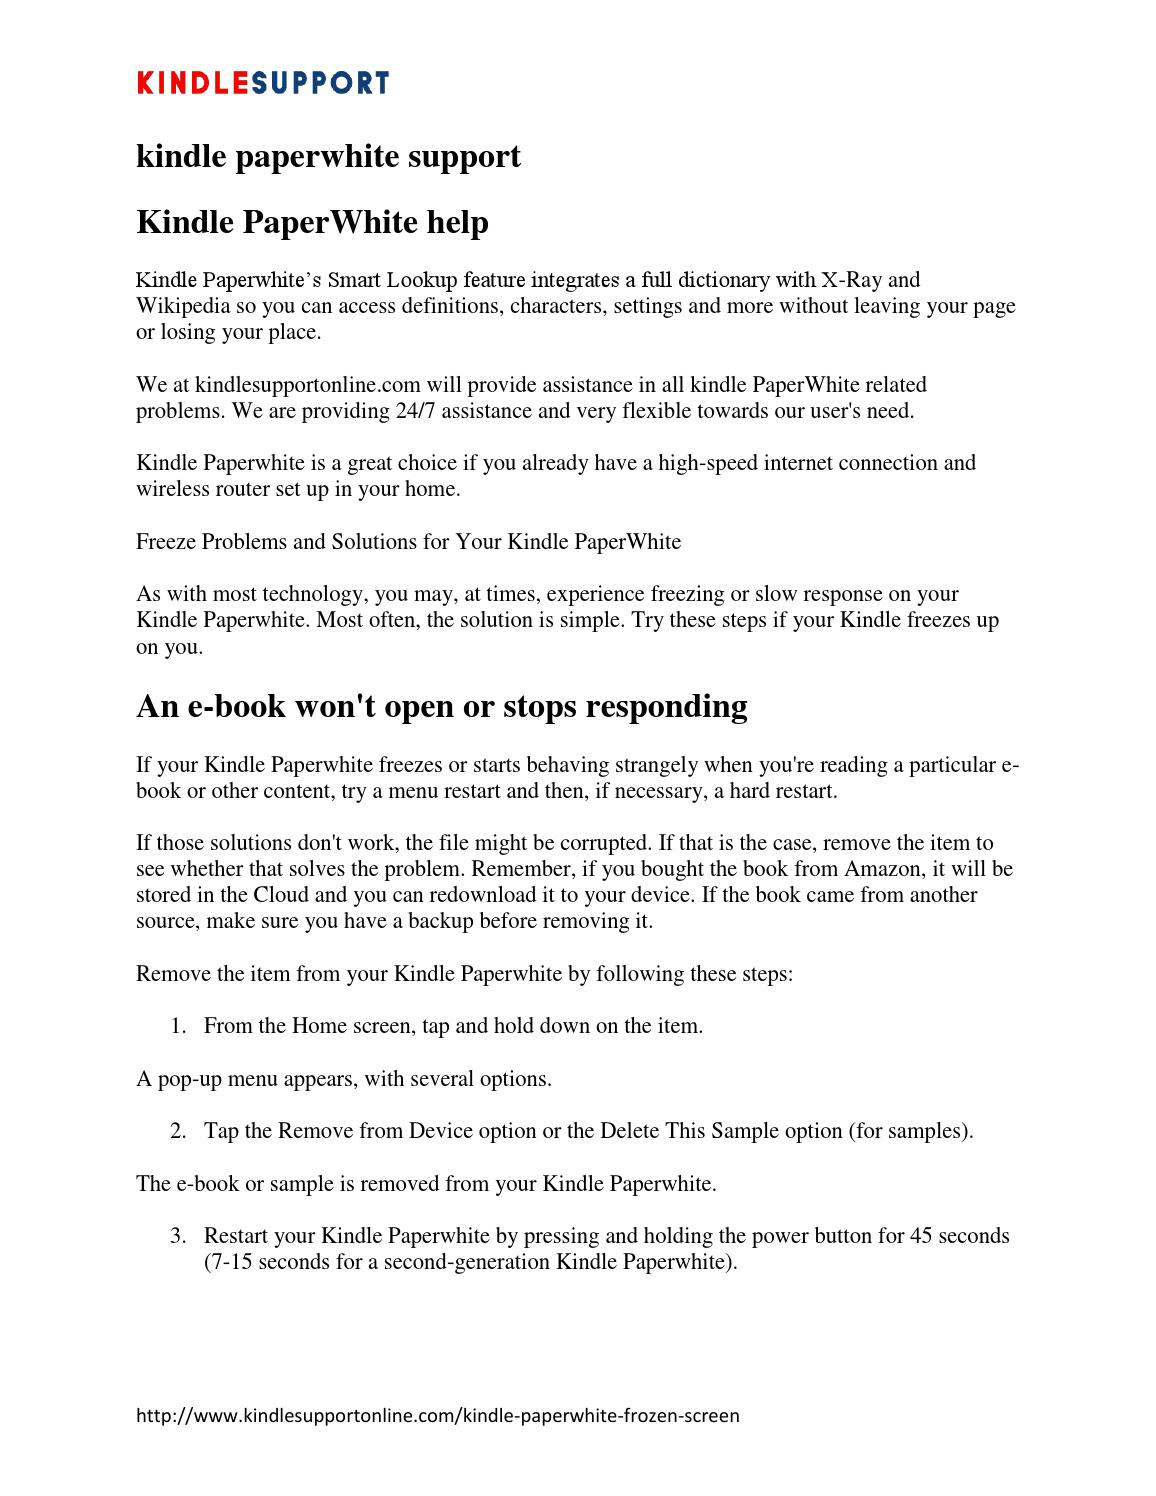 Kindle paperwhite screen frozen | Kindle Paperwhite Frozen, Help or